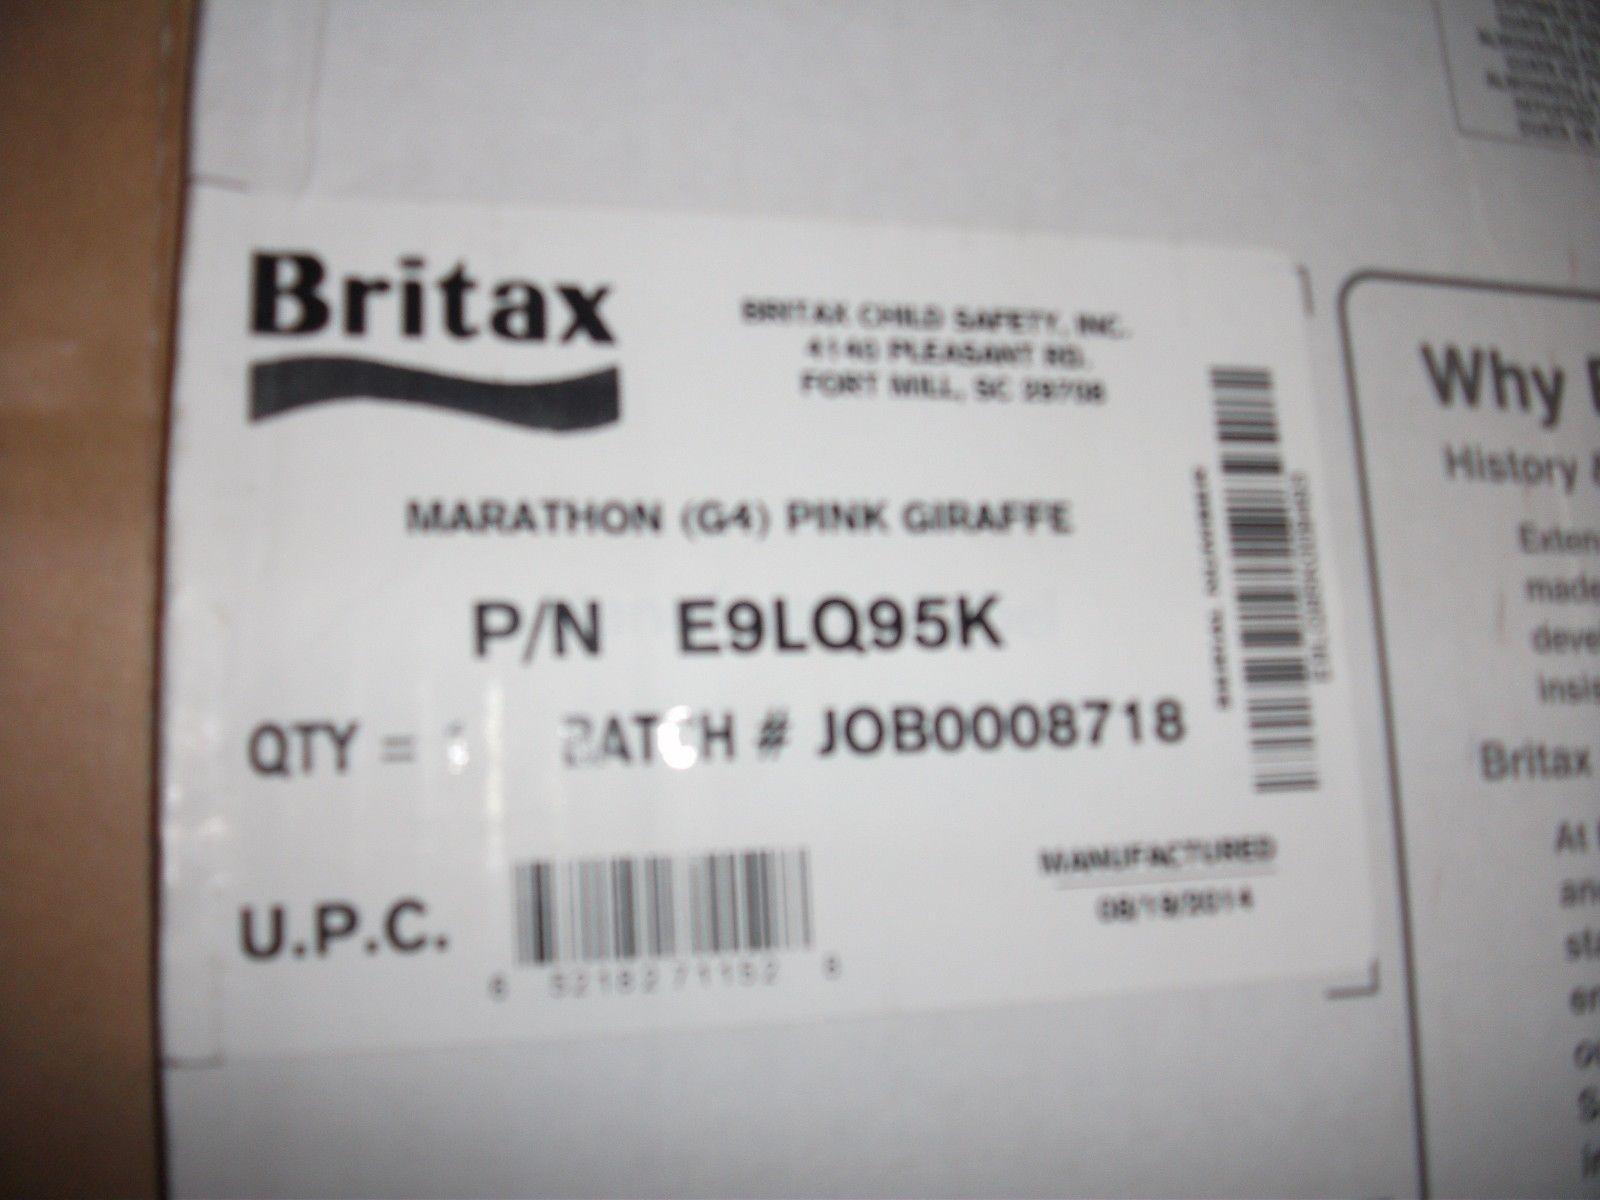 Britax Marathon G4 Convertible Car Seat Pink Giraffe   Common ...